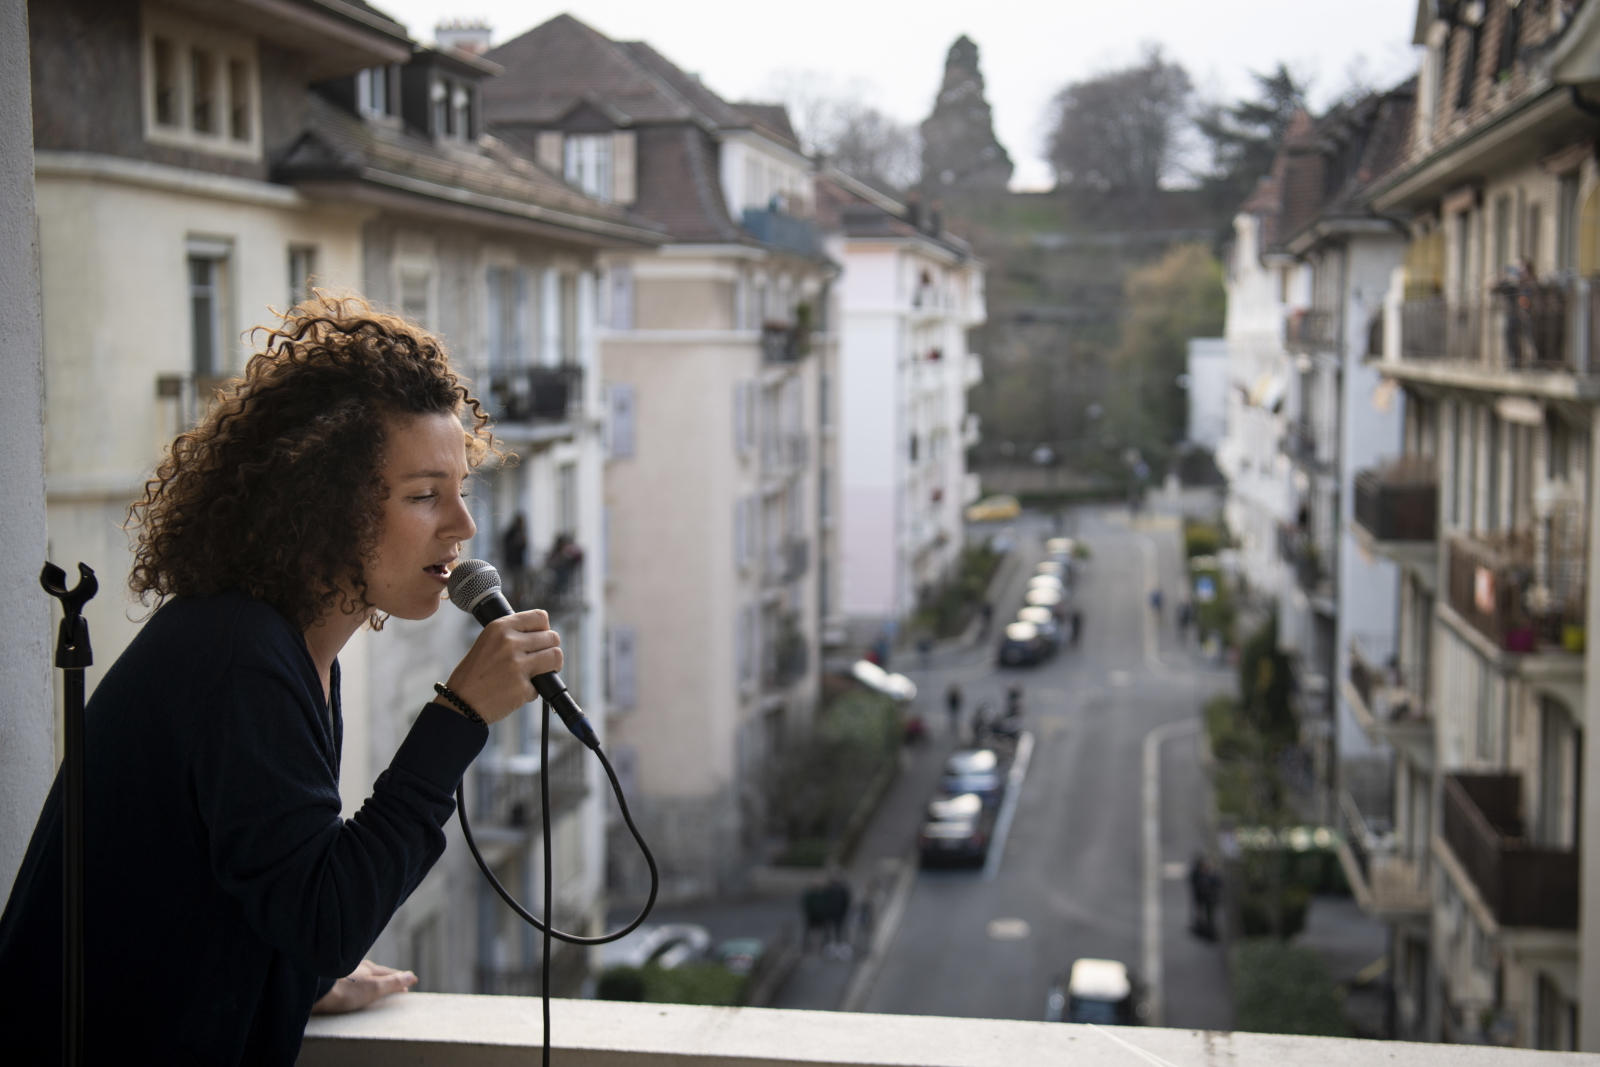 Kwarantanna w Szwajcarii fot. EPA/LAURENT GILLIERON